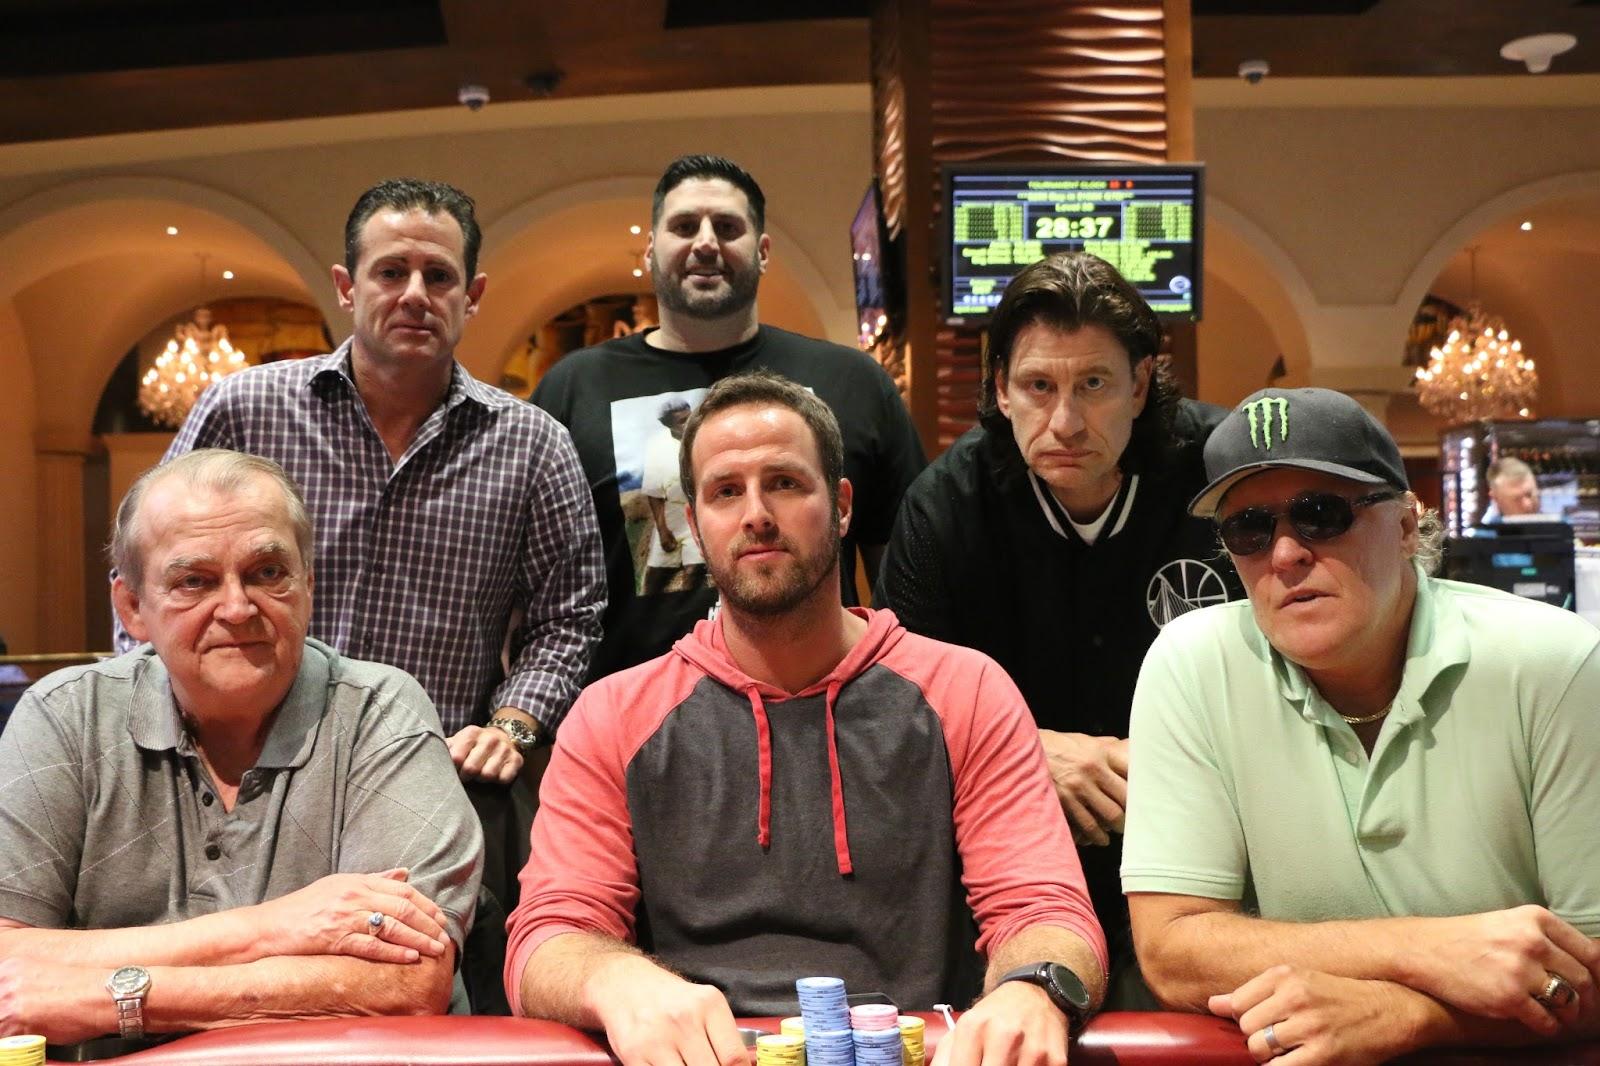 Robert transue poker craps table game online